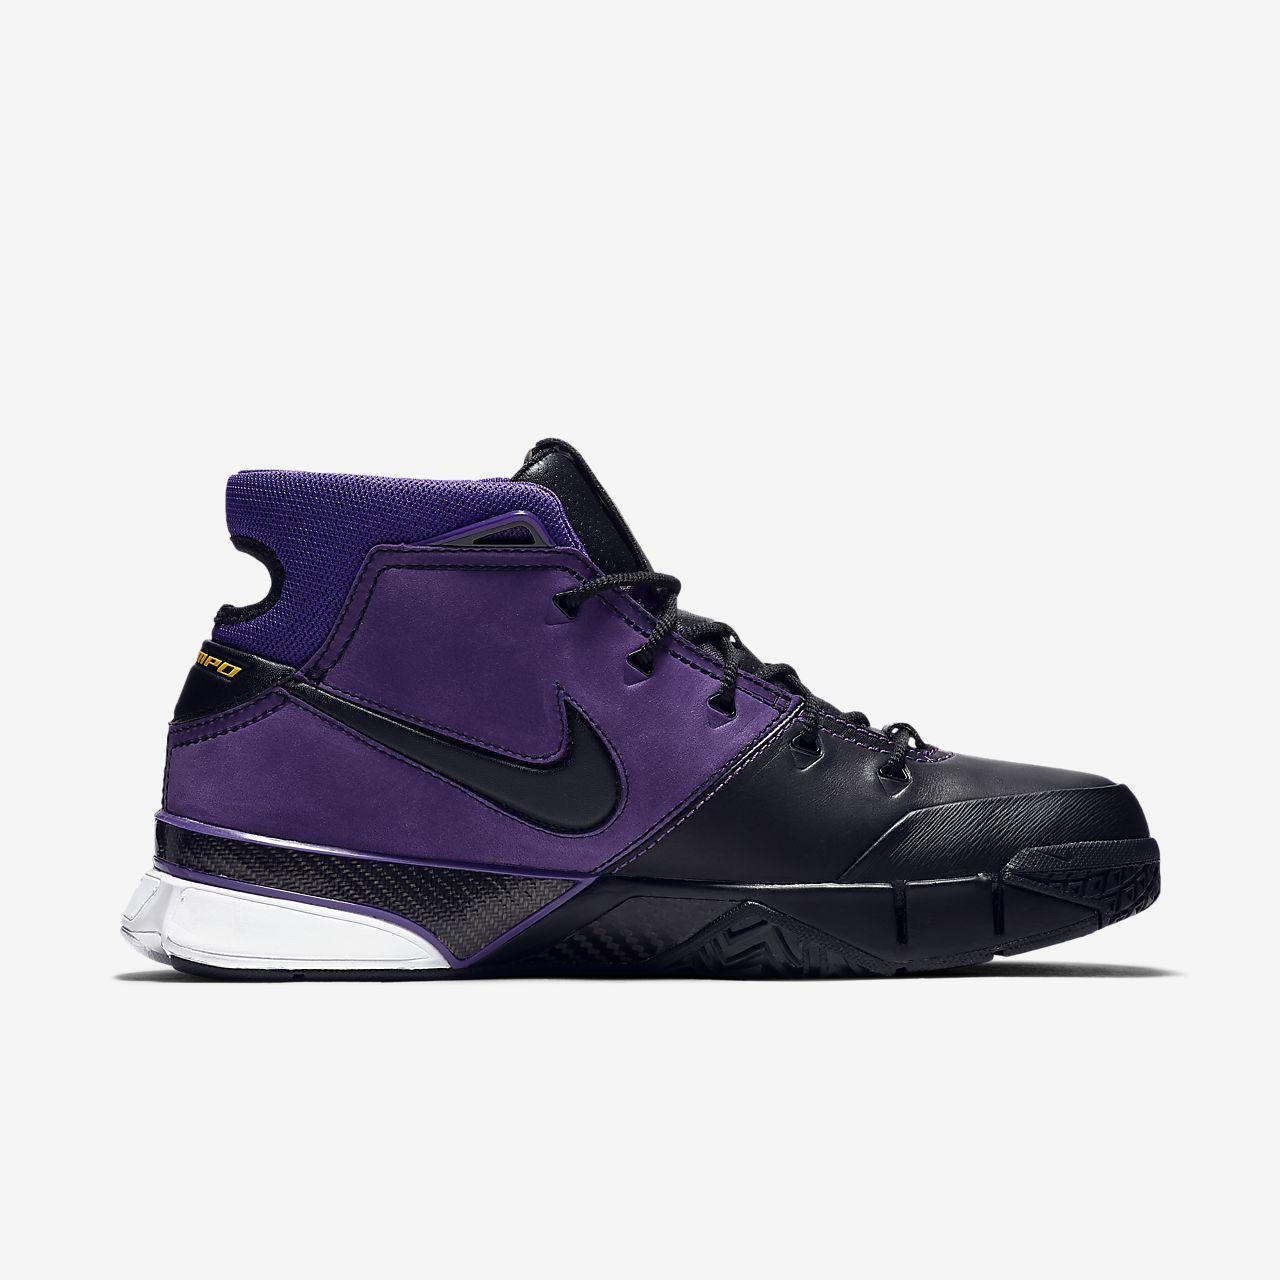 d80775e294f7 Kobe 1 Protro Basketball Shoe. Nike.com GB